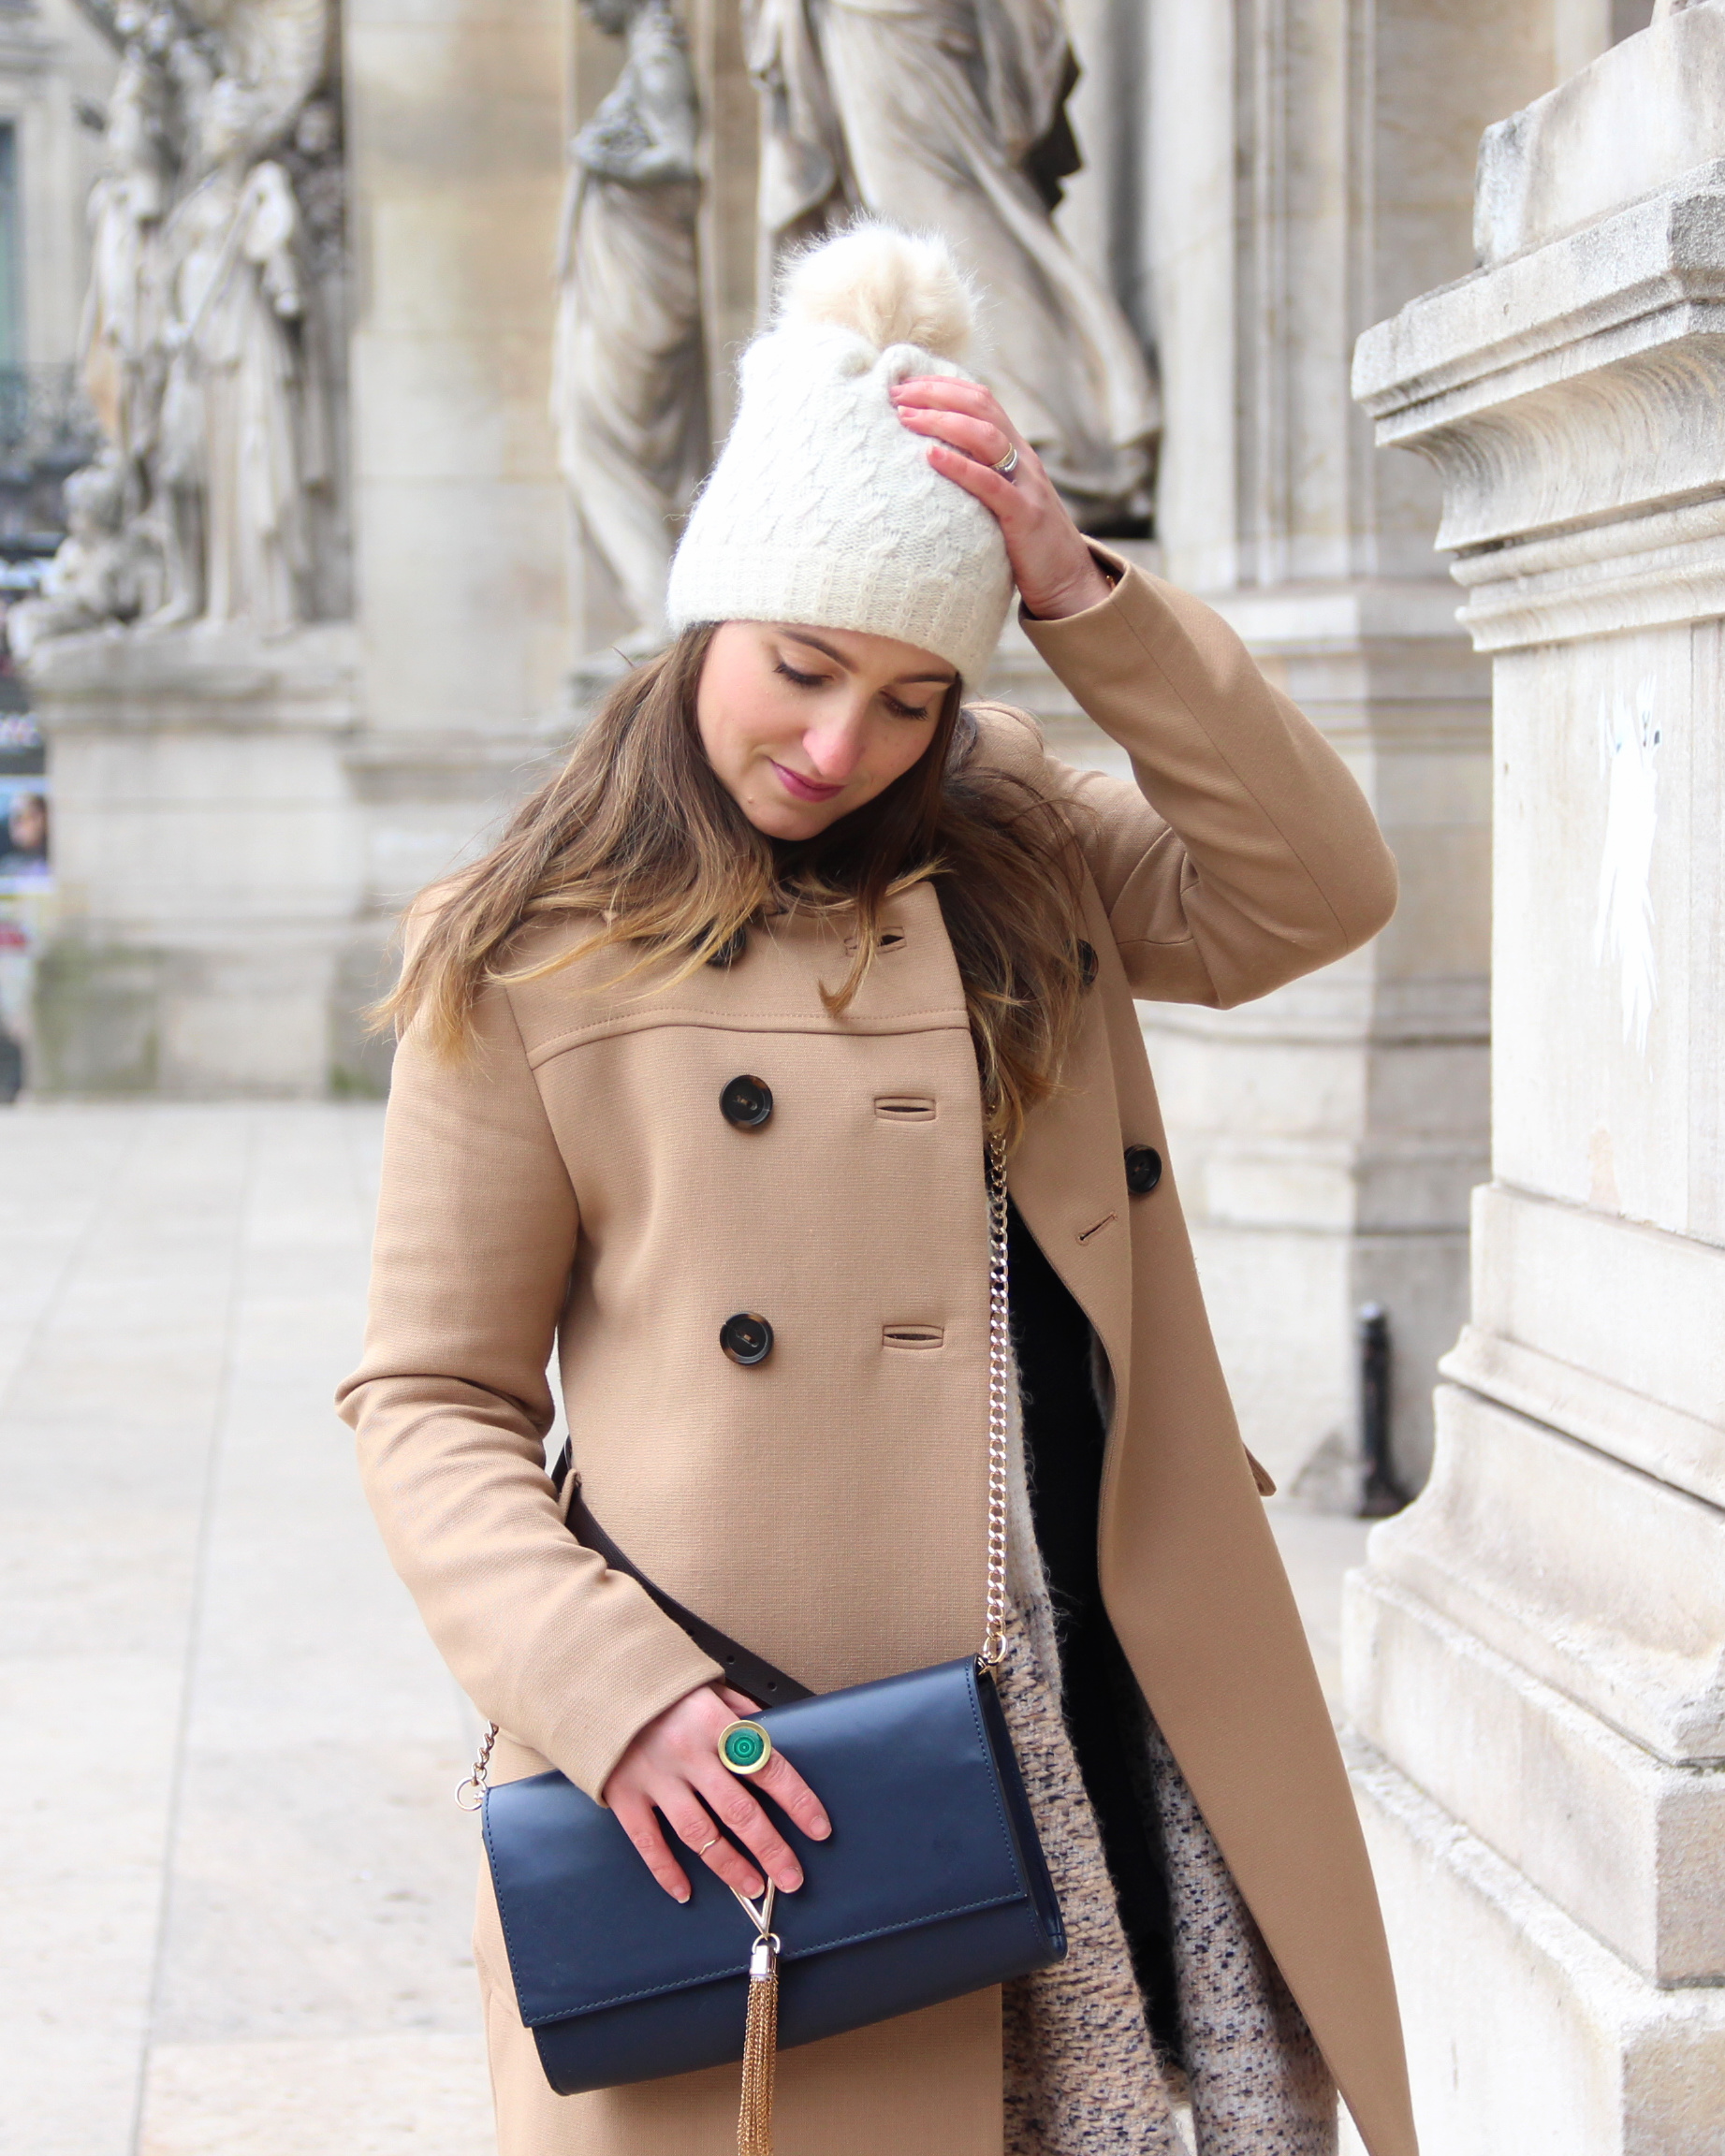 paris-opera-garnier-winter-day-influencer-style-personalstylist-imageconsultant-seralynepointcom-img_6639